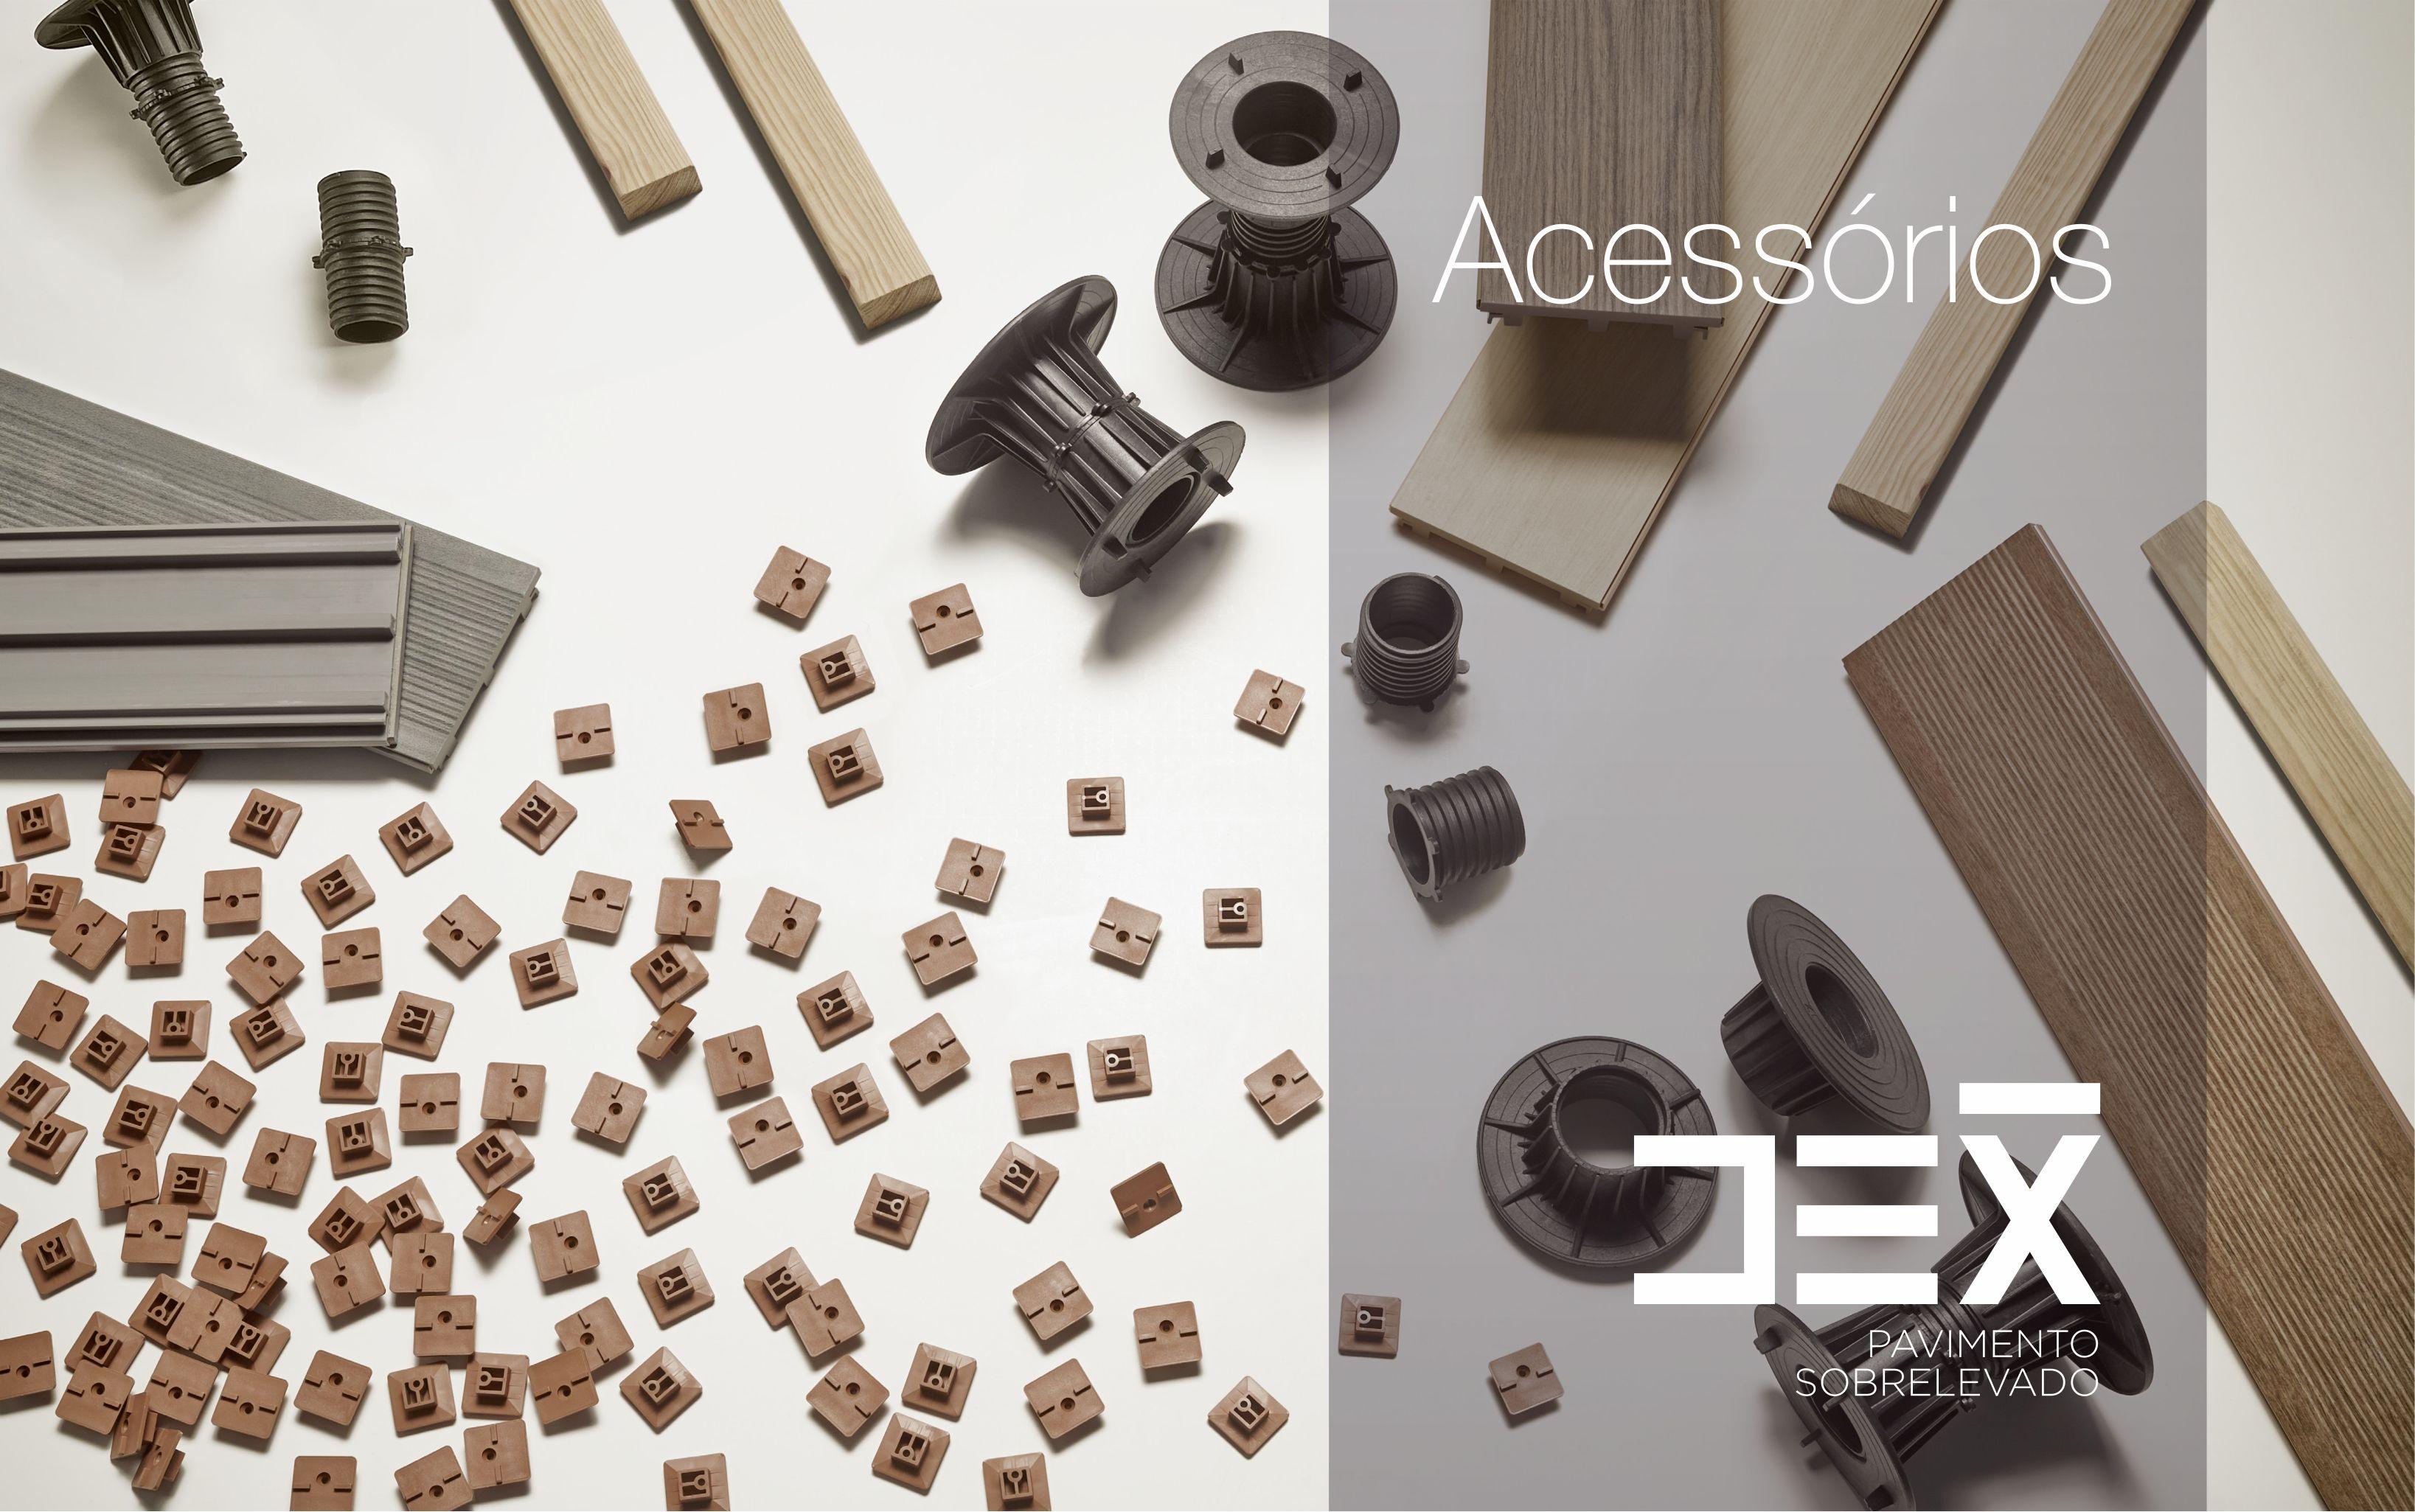 Pavimento sobreelevado  Acessórios DEX -- DEX accessories #itcom #itcomindustrial #dex #pavimentosobreelevado #raisedflooring #flooring #architecture #architektur